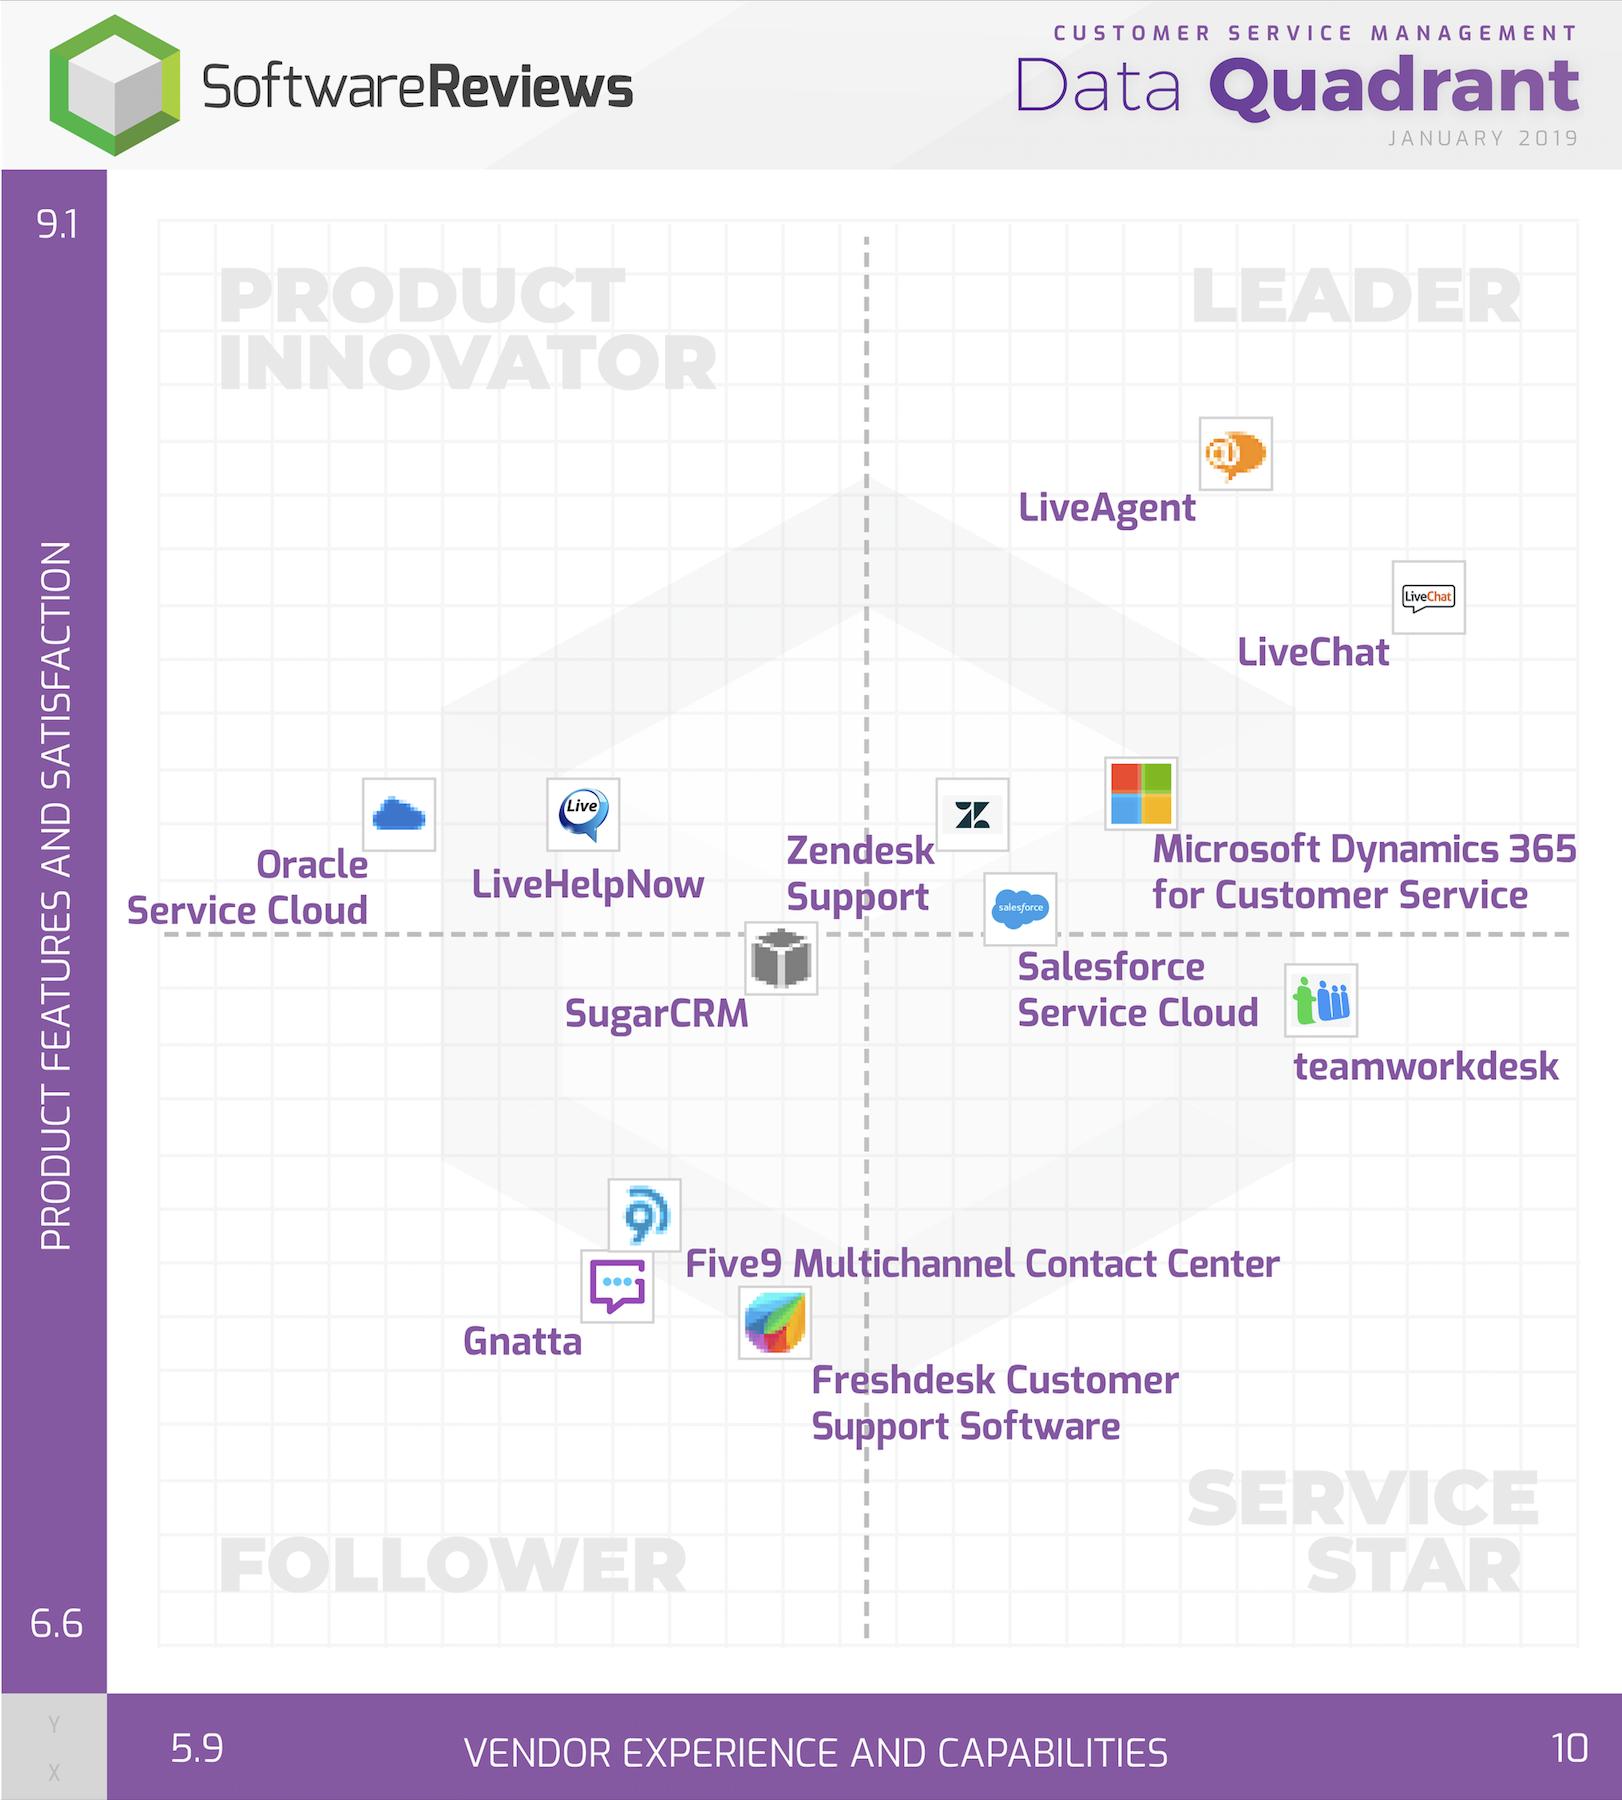 Customer Service Management Data Quadrant